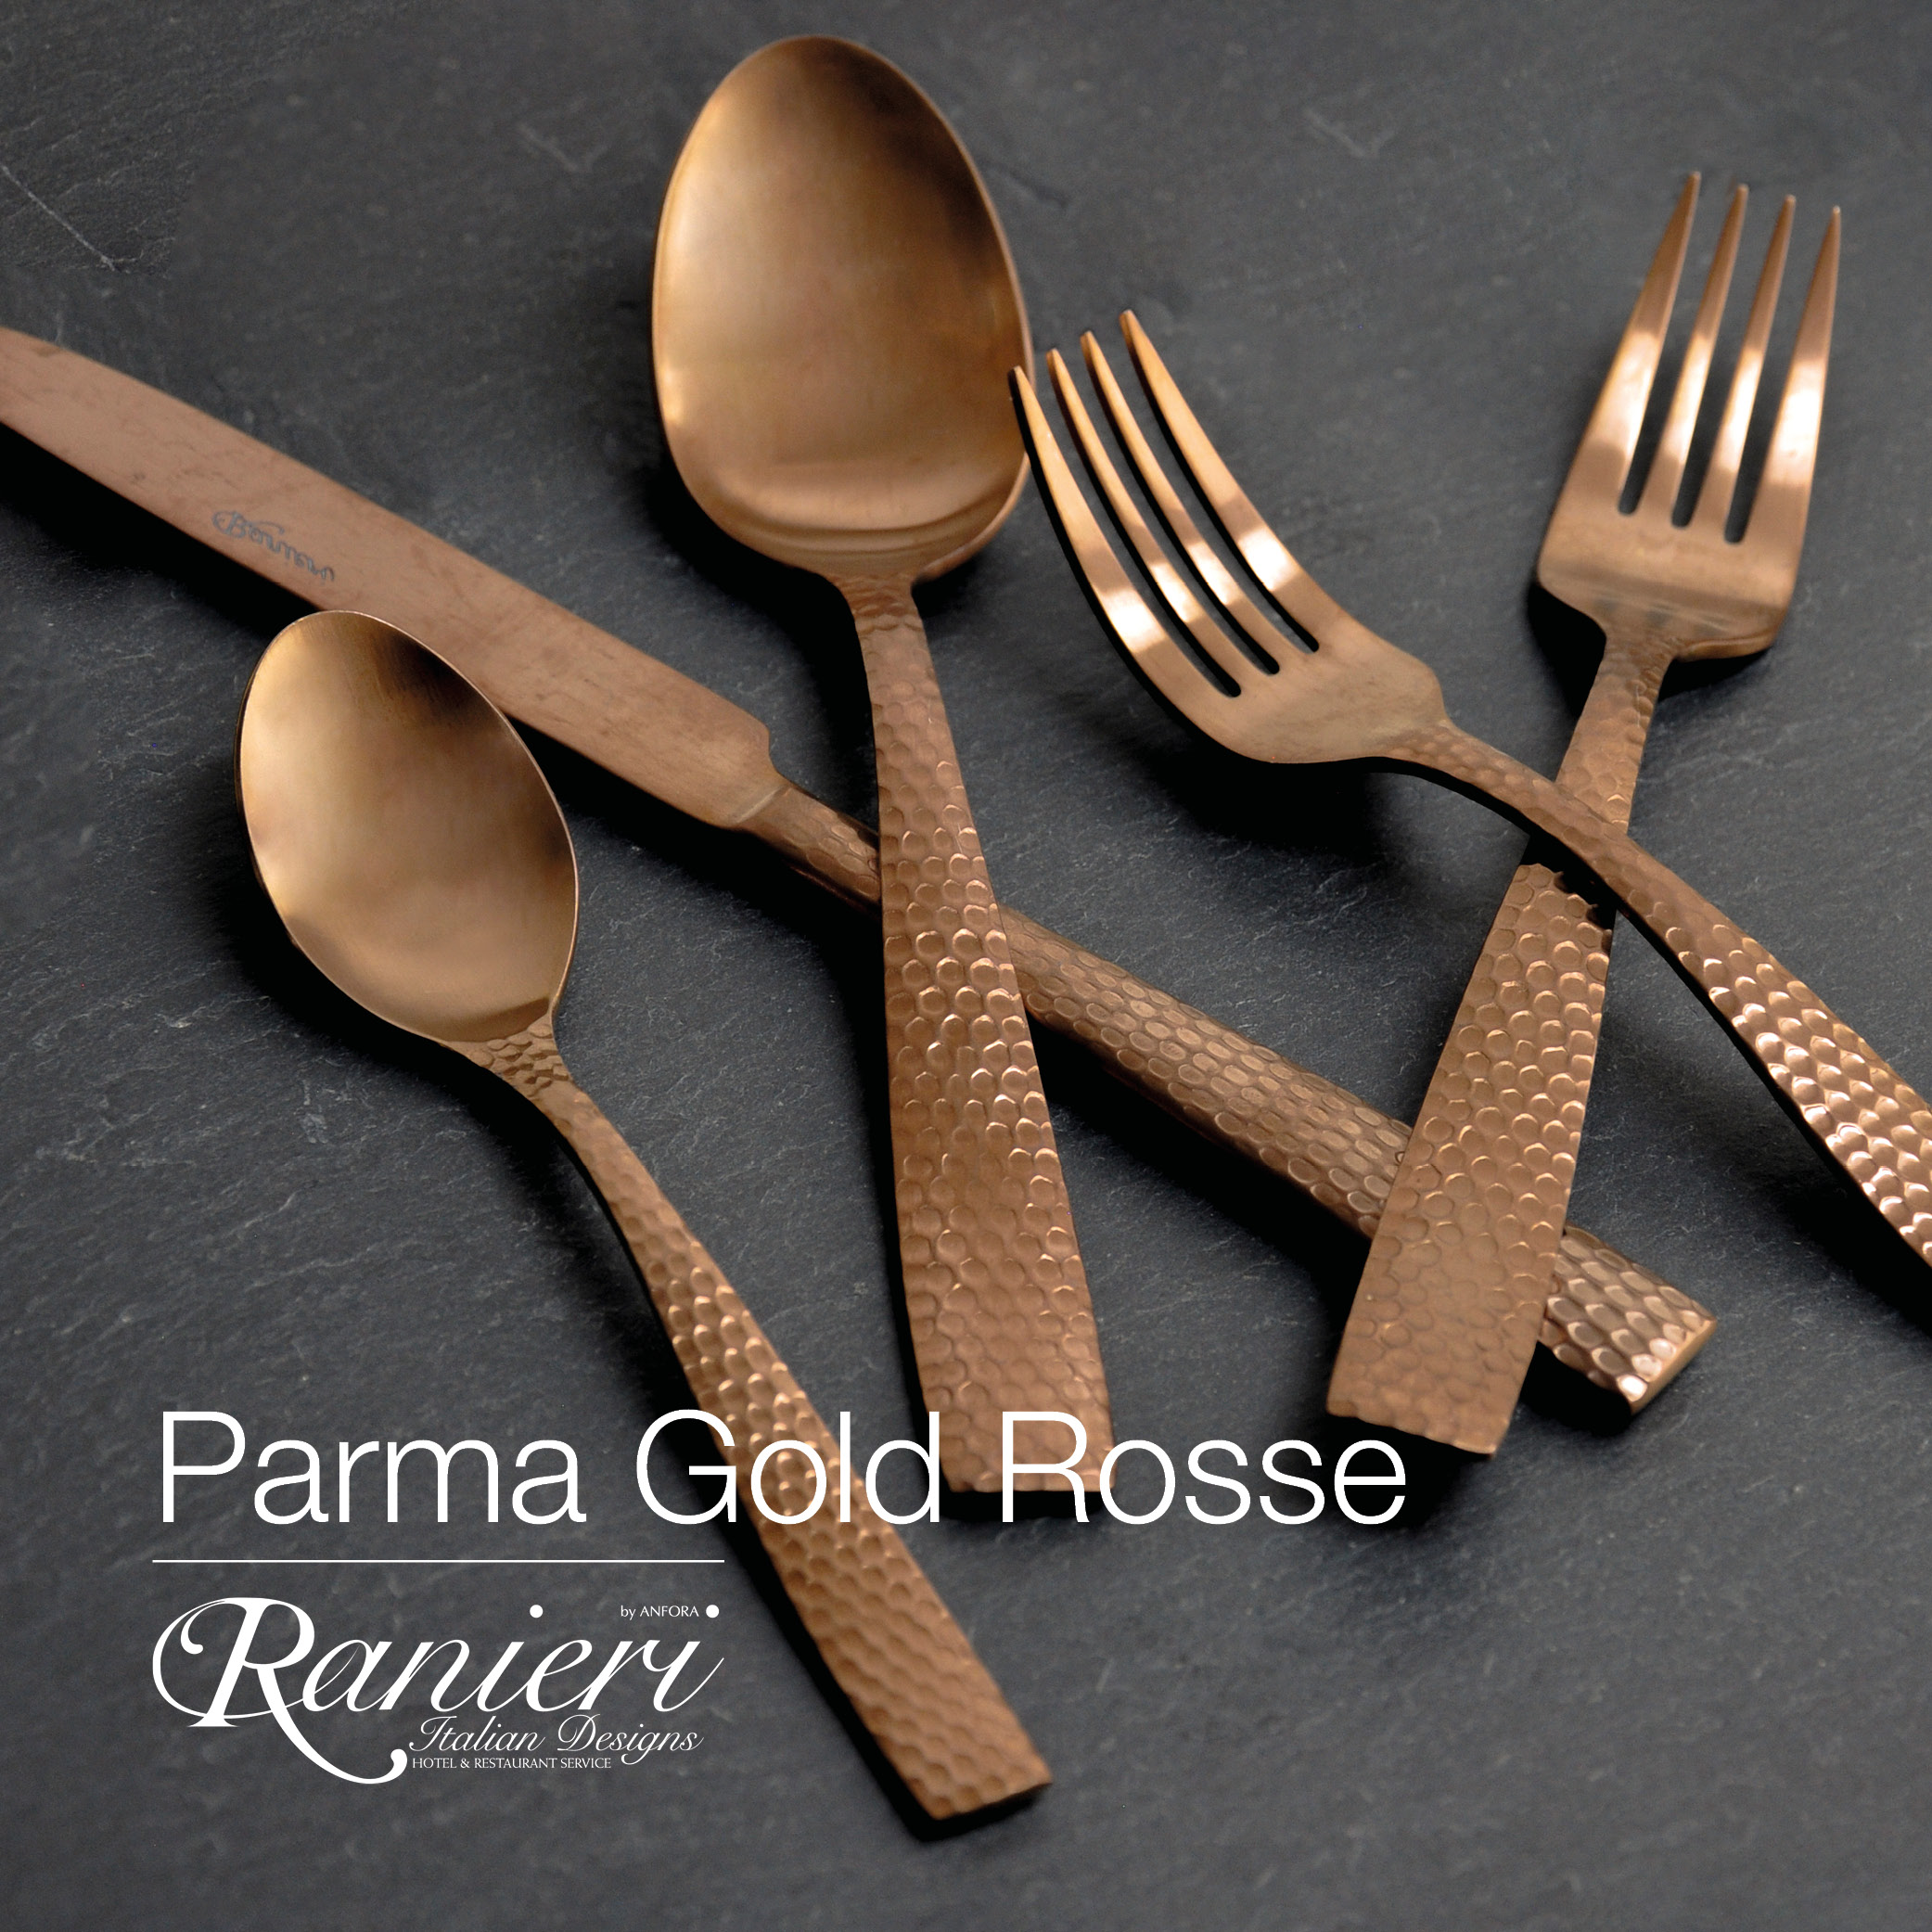 Parma Gold Rosse